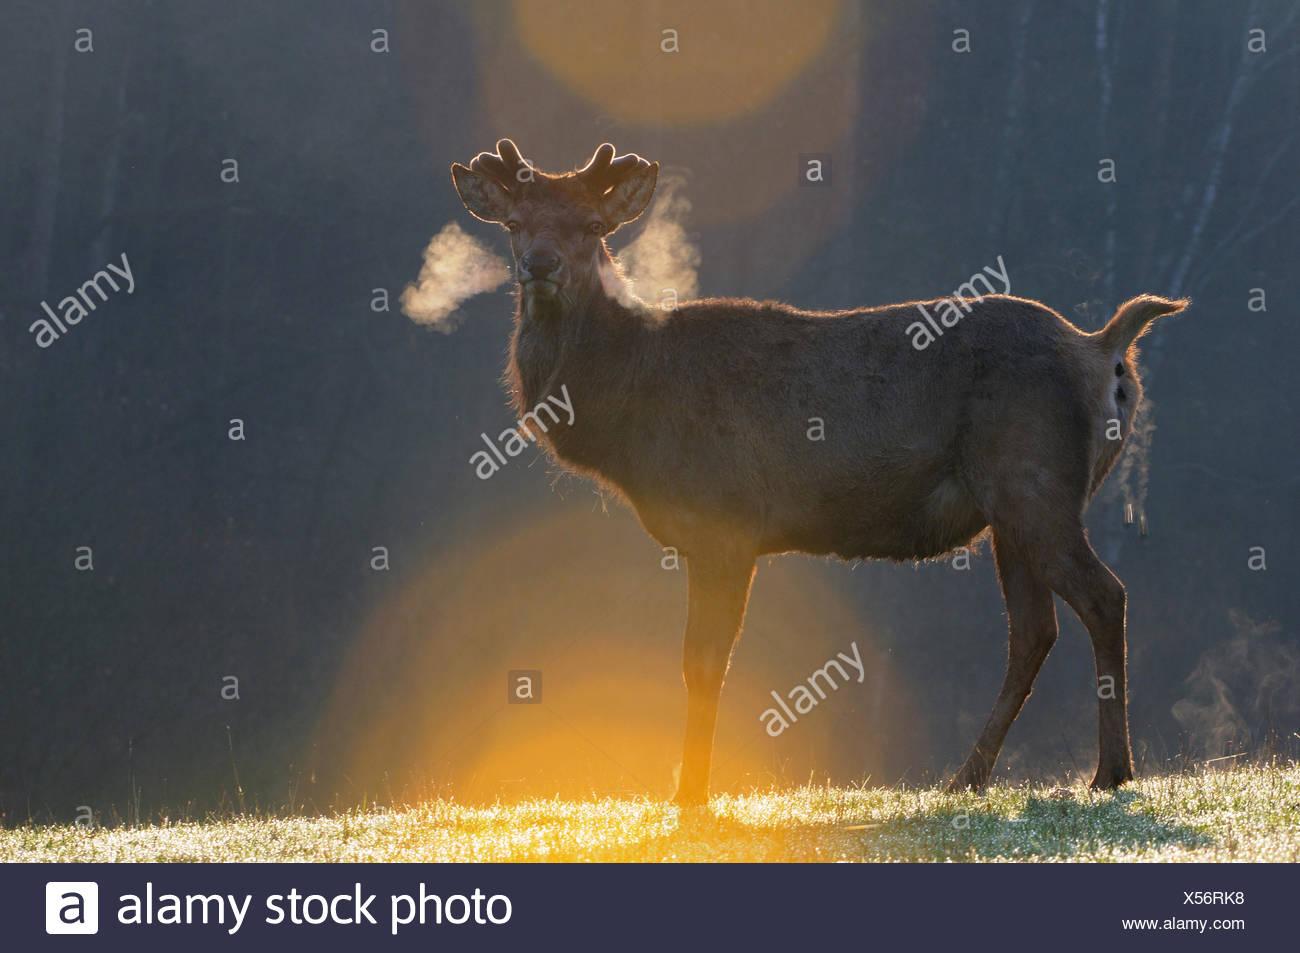 Red deer antlers antler Cervid Cervus elaphus deer stag stags hoofed animals European deer spring velvet animal animals Germ - Stock Image